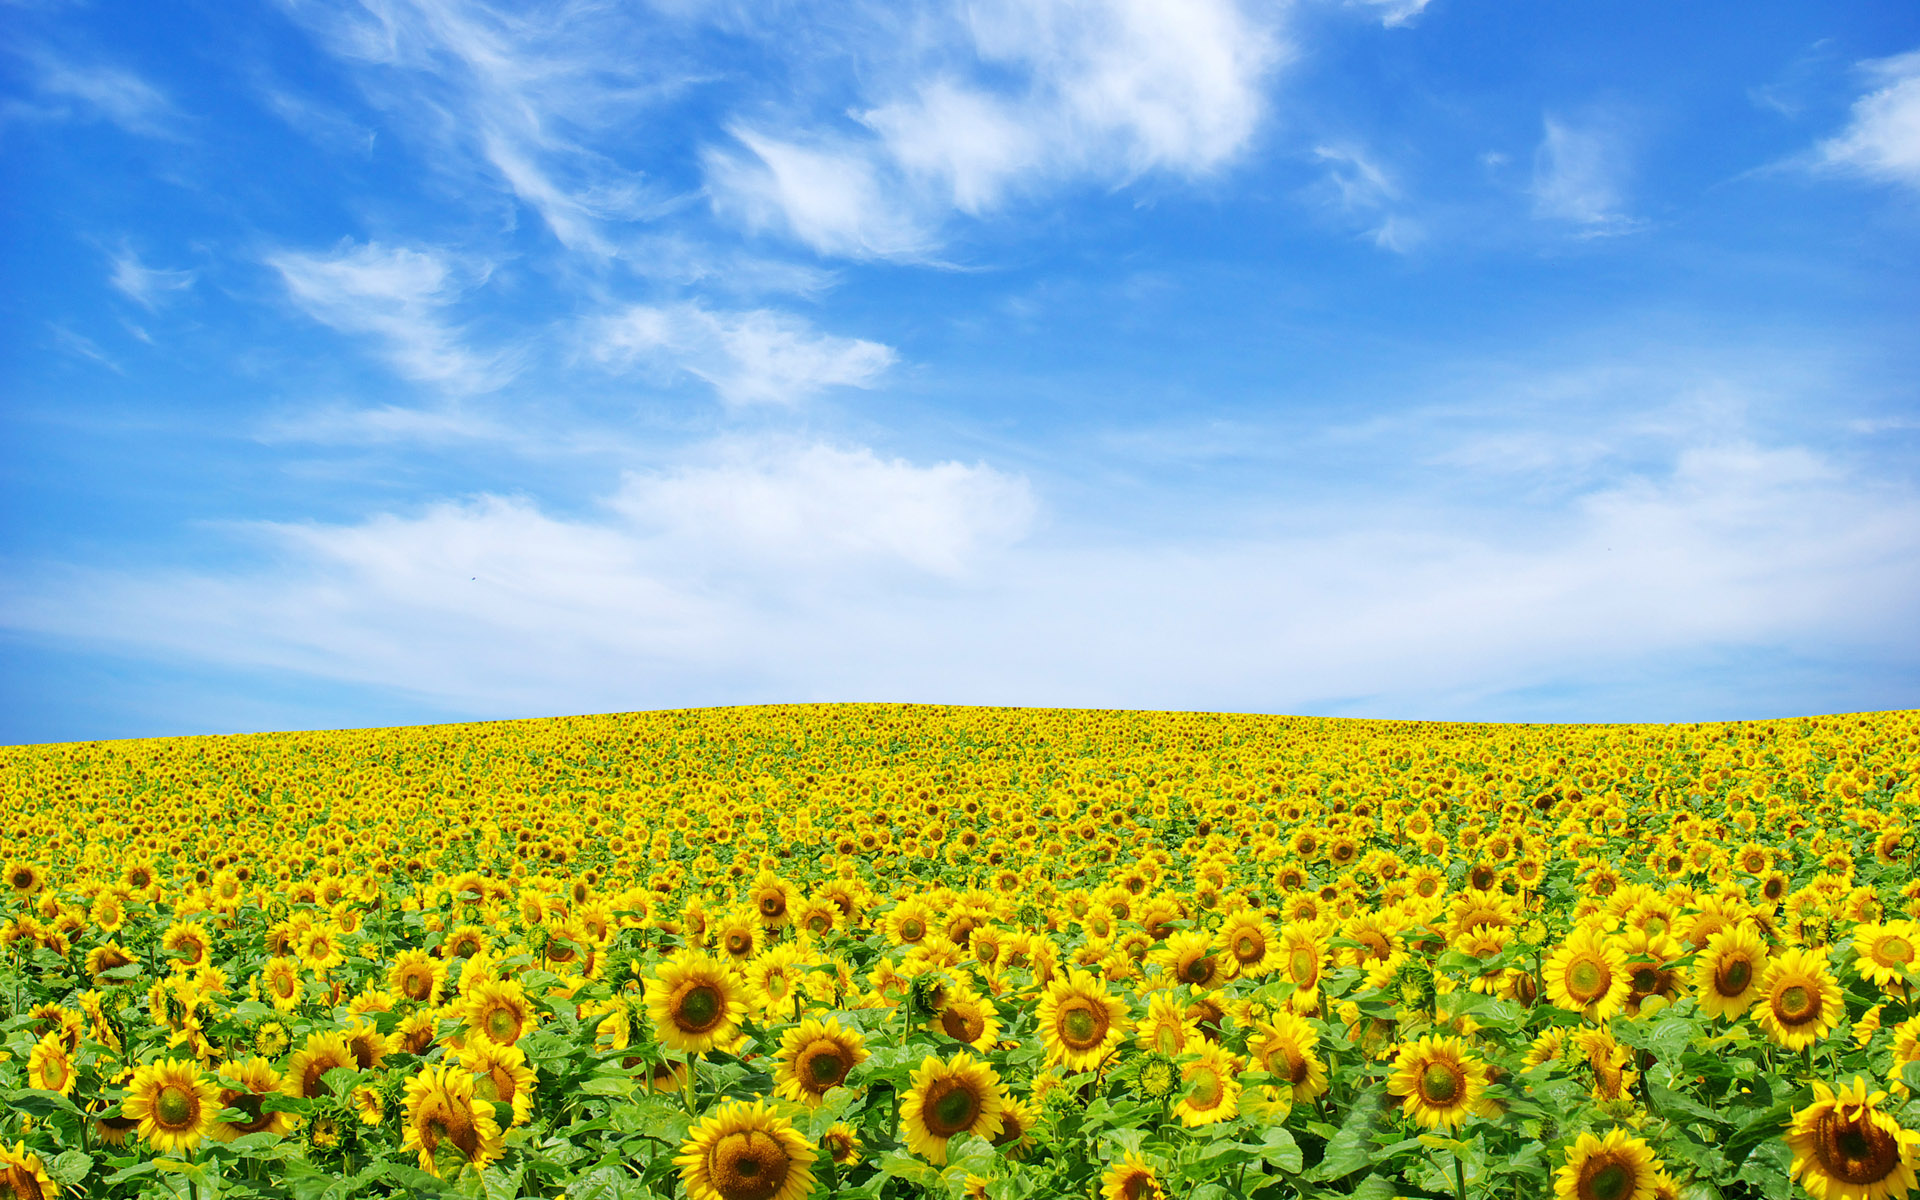 Flower Landscape HD 29016 1920x1080 px